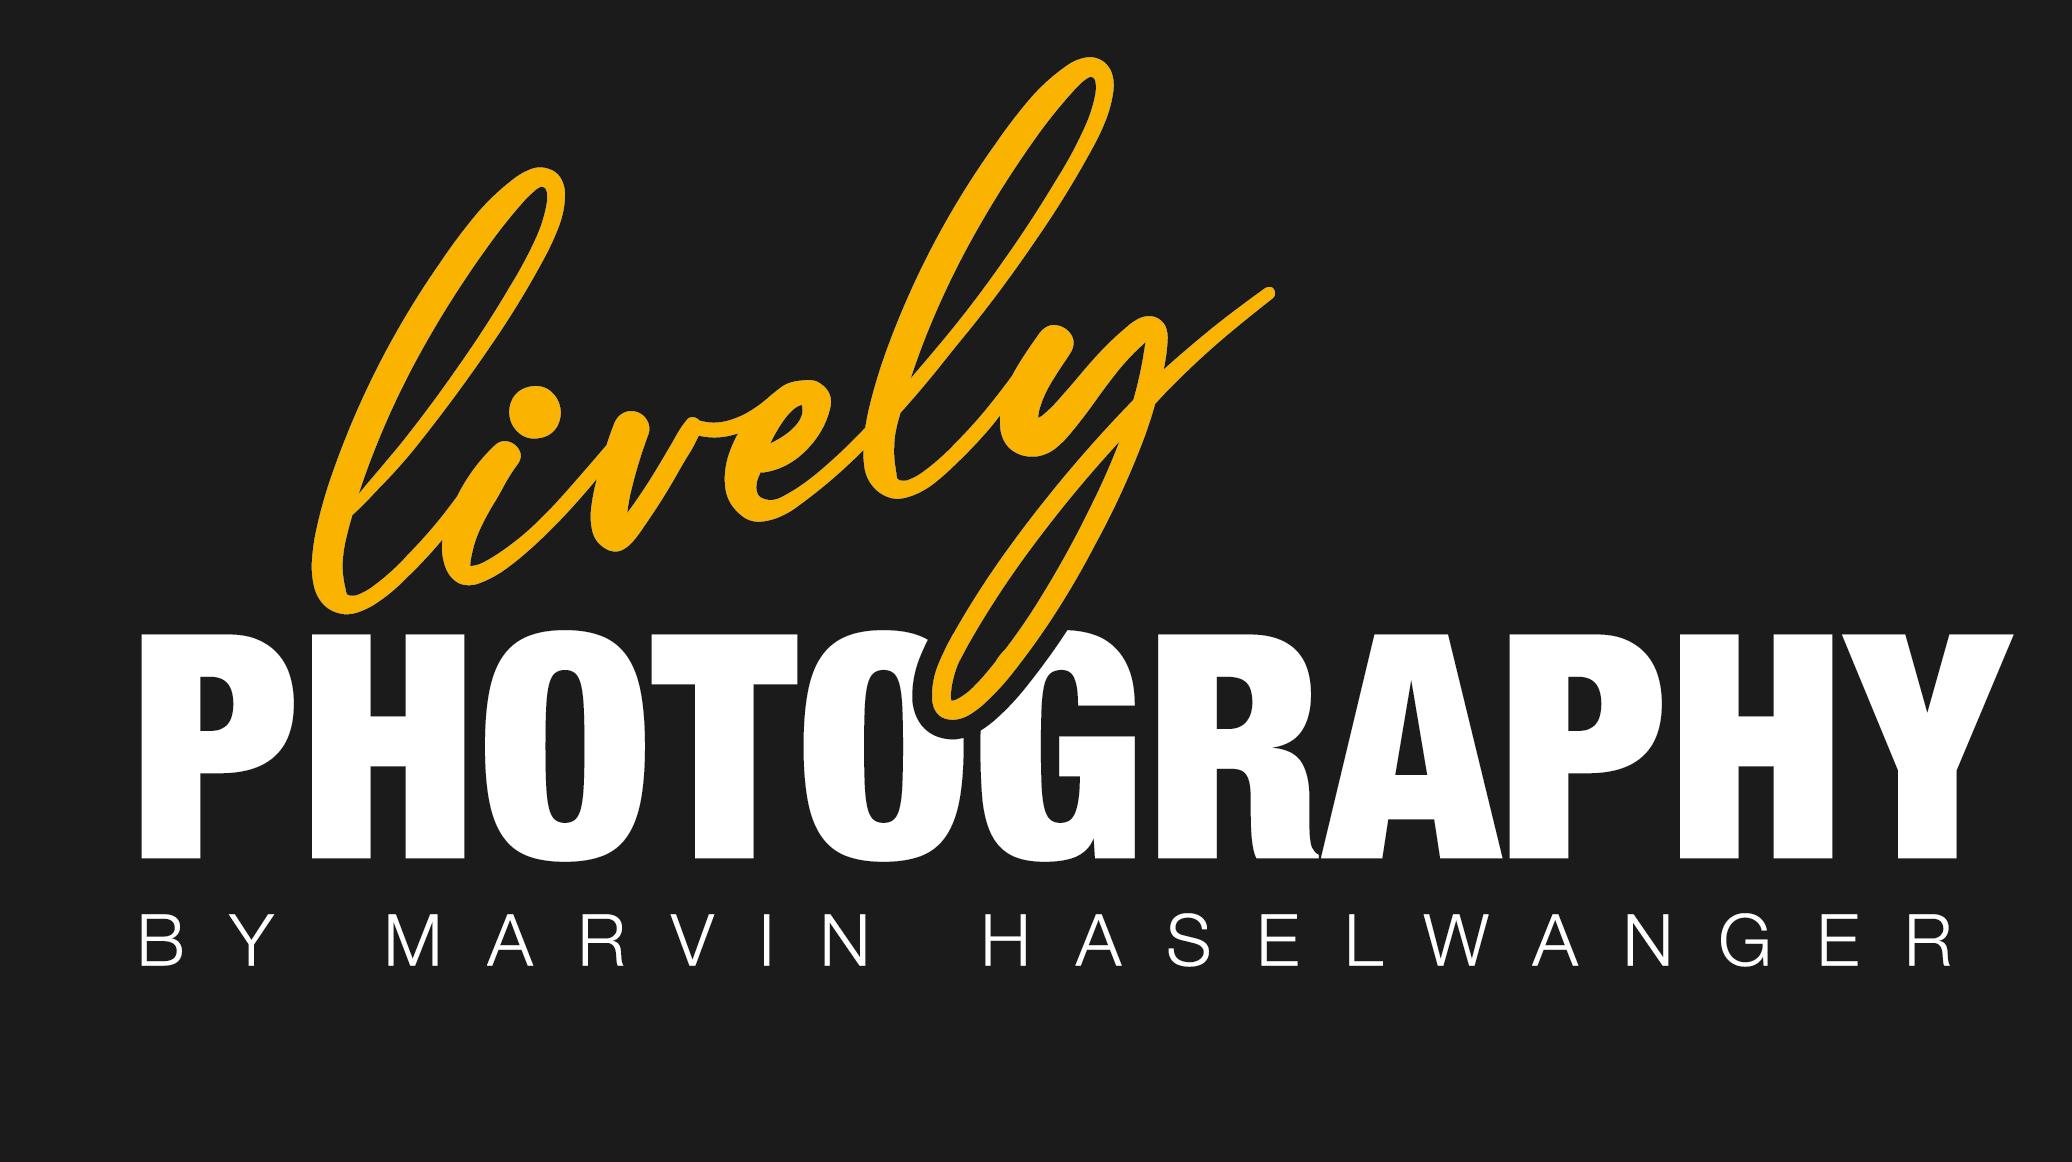 Marvin Haselwanger